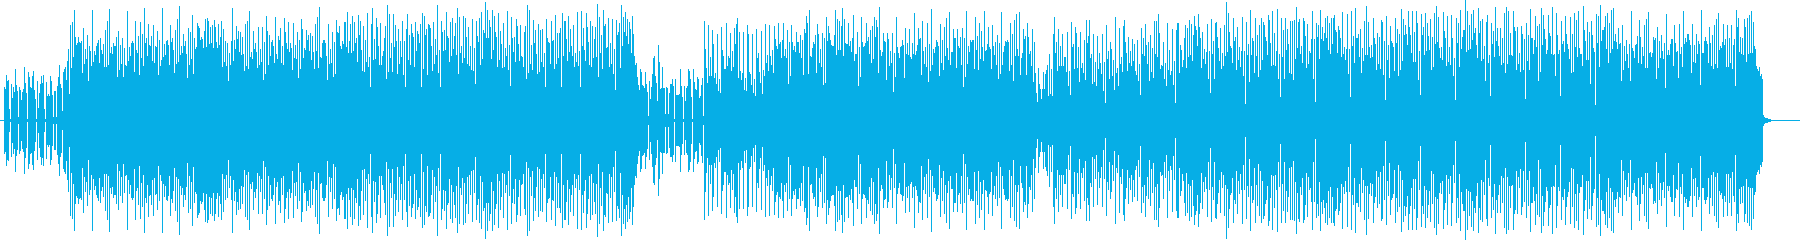 Light and near-future techno pops's reproduced waveform